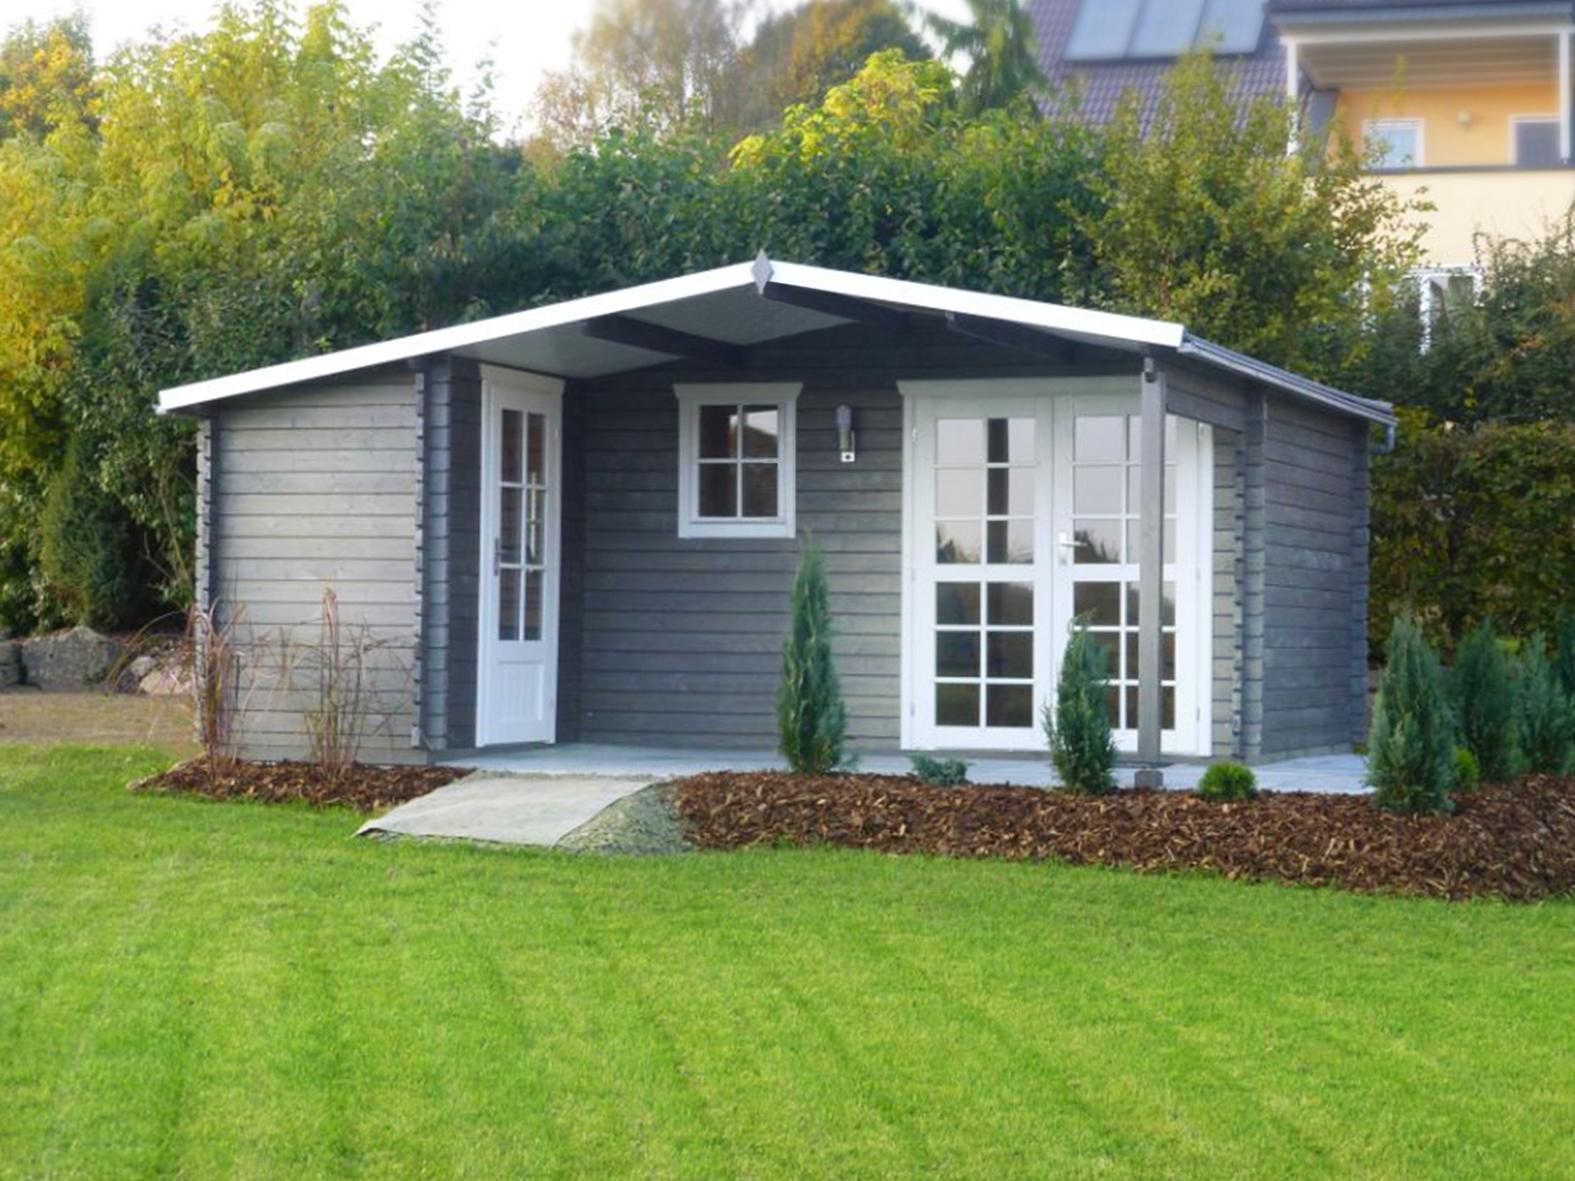 gartenhaus blockhaus ger tehaus holz 510x480 28 mm 283931. Black Bedroom Furniture Sets. Home Design Ideas